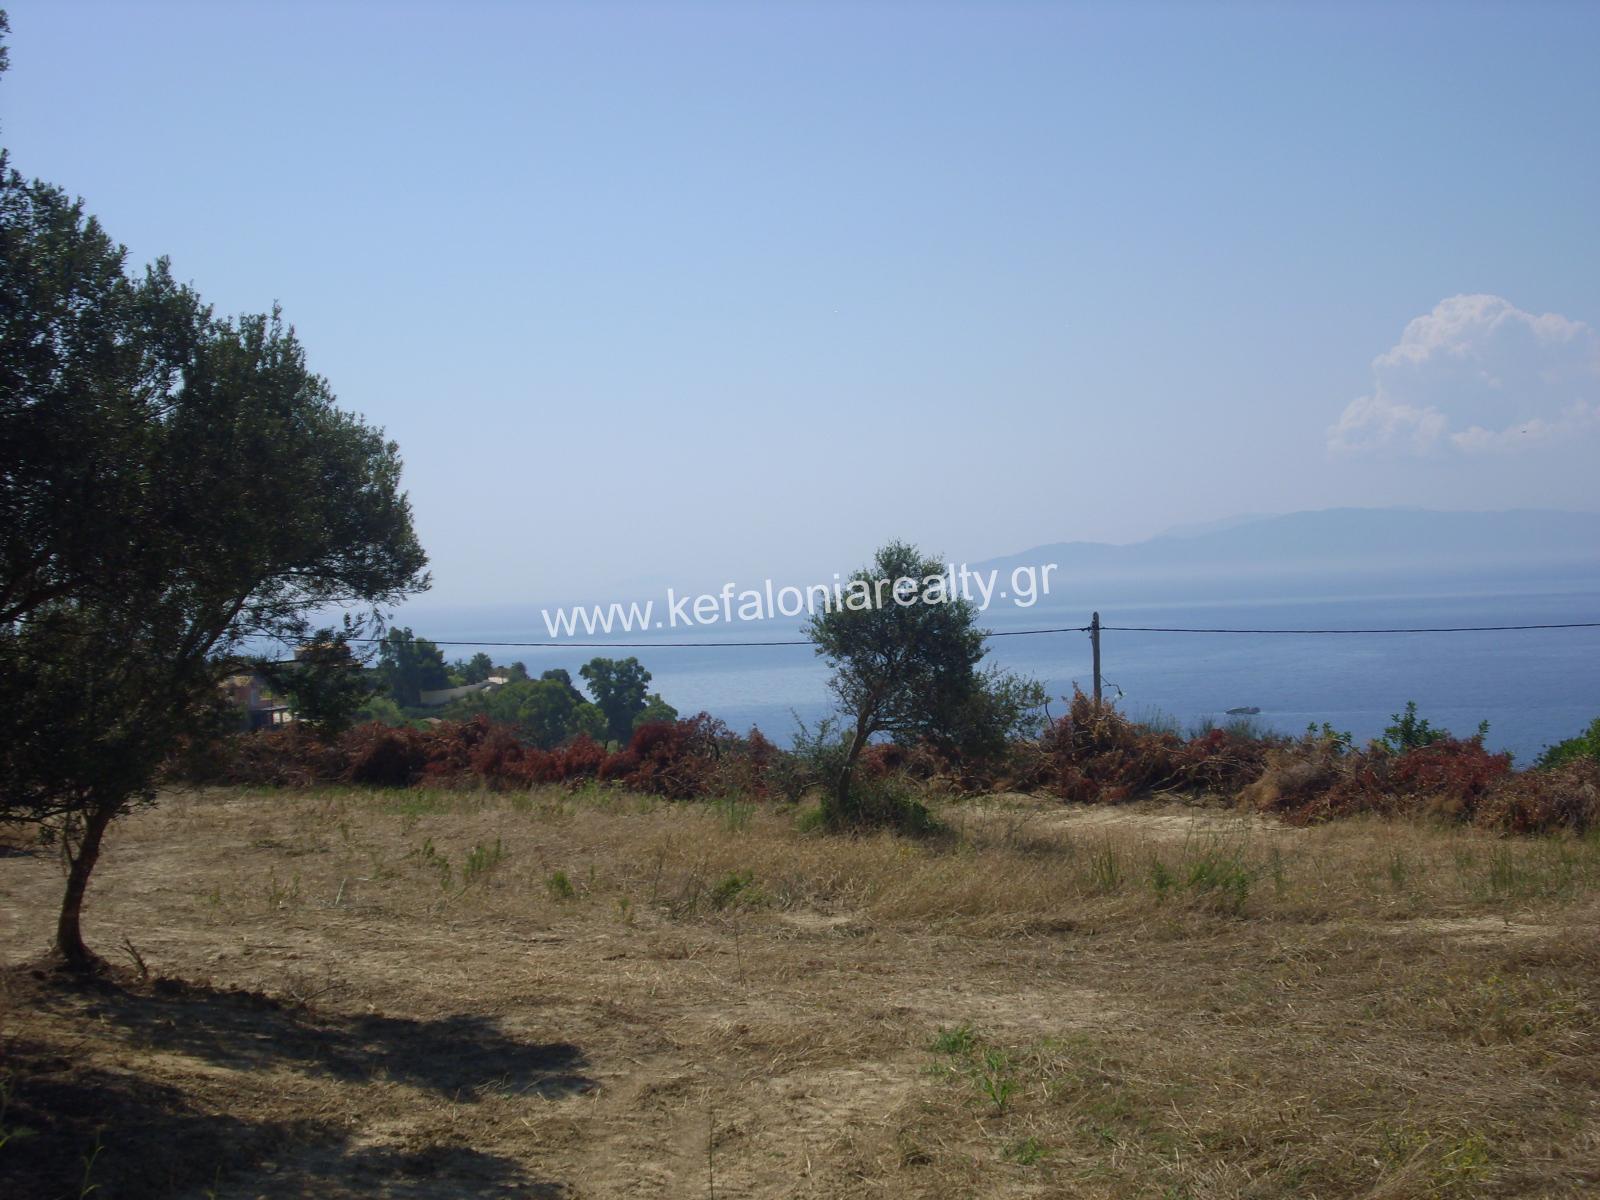 Land For Sale In Spartia – Liakas Area